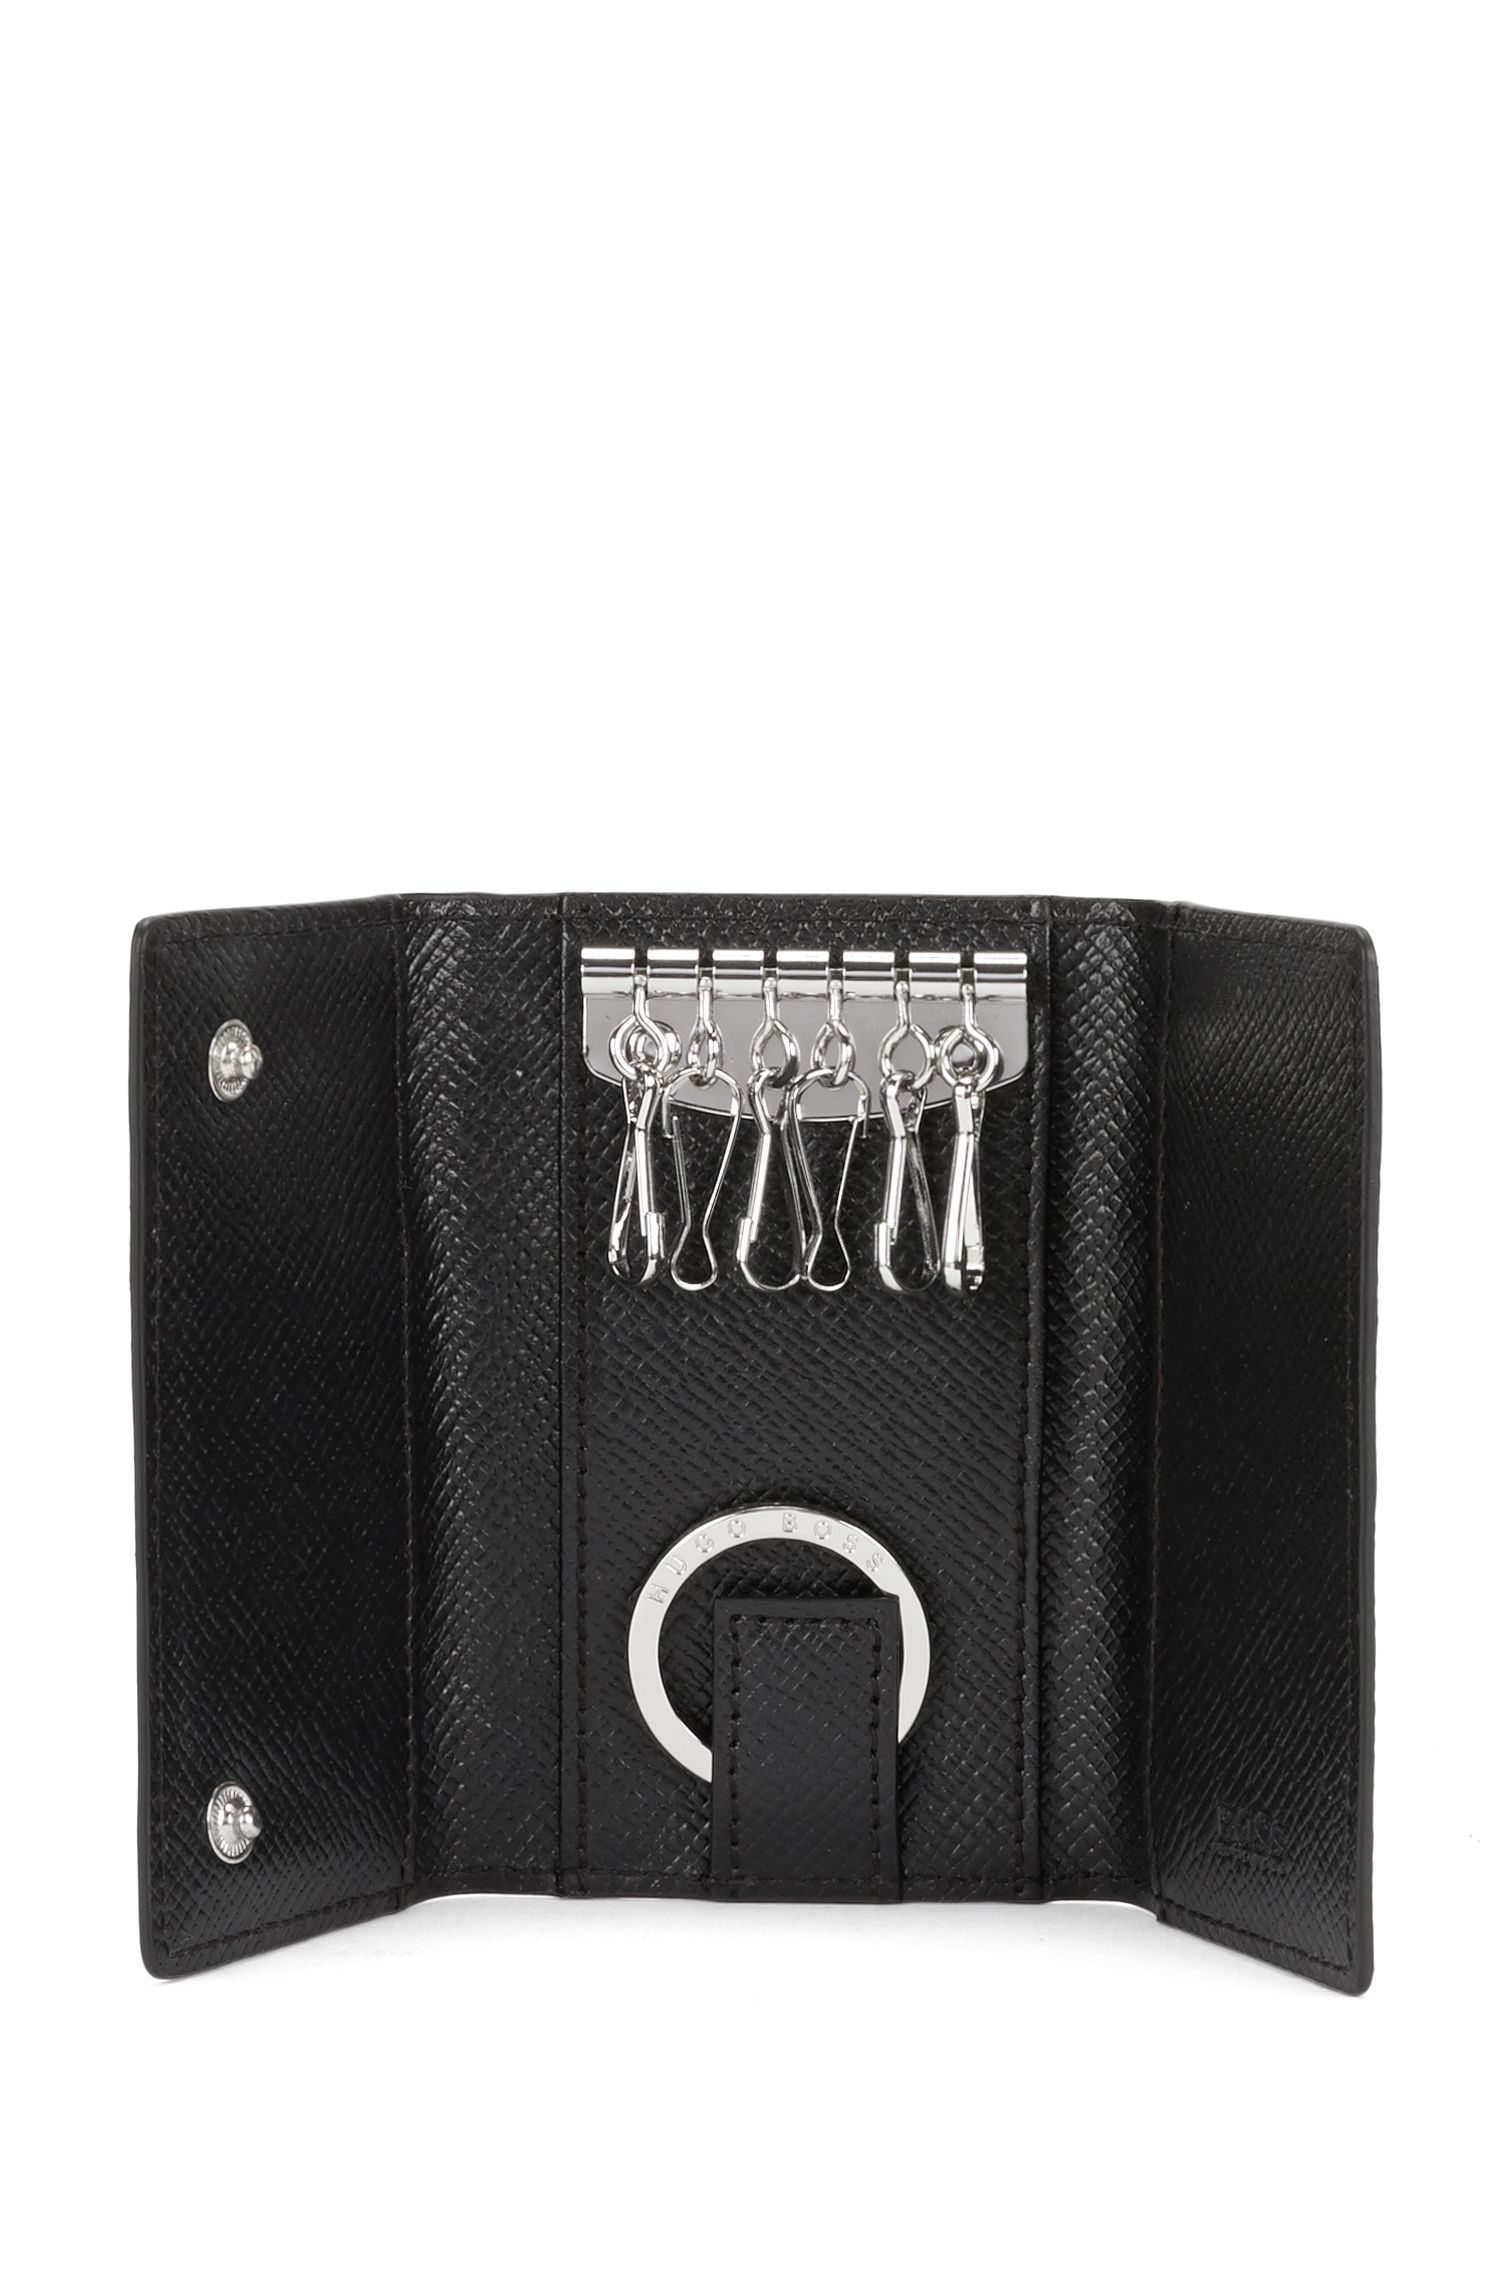 Étui porte-clés en cuir: «Signature_7keys»